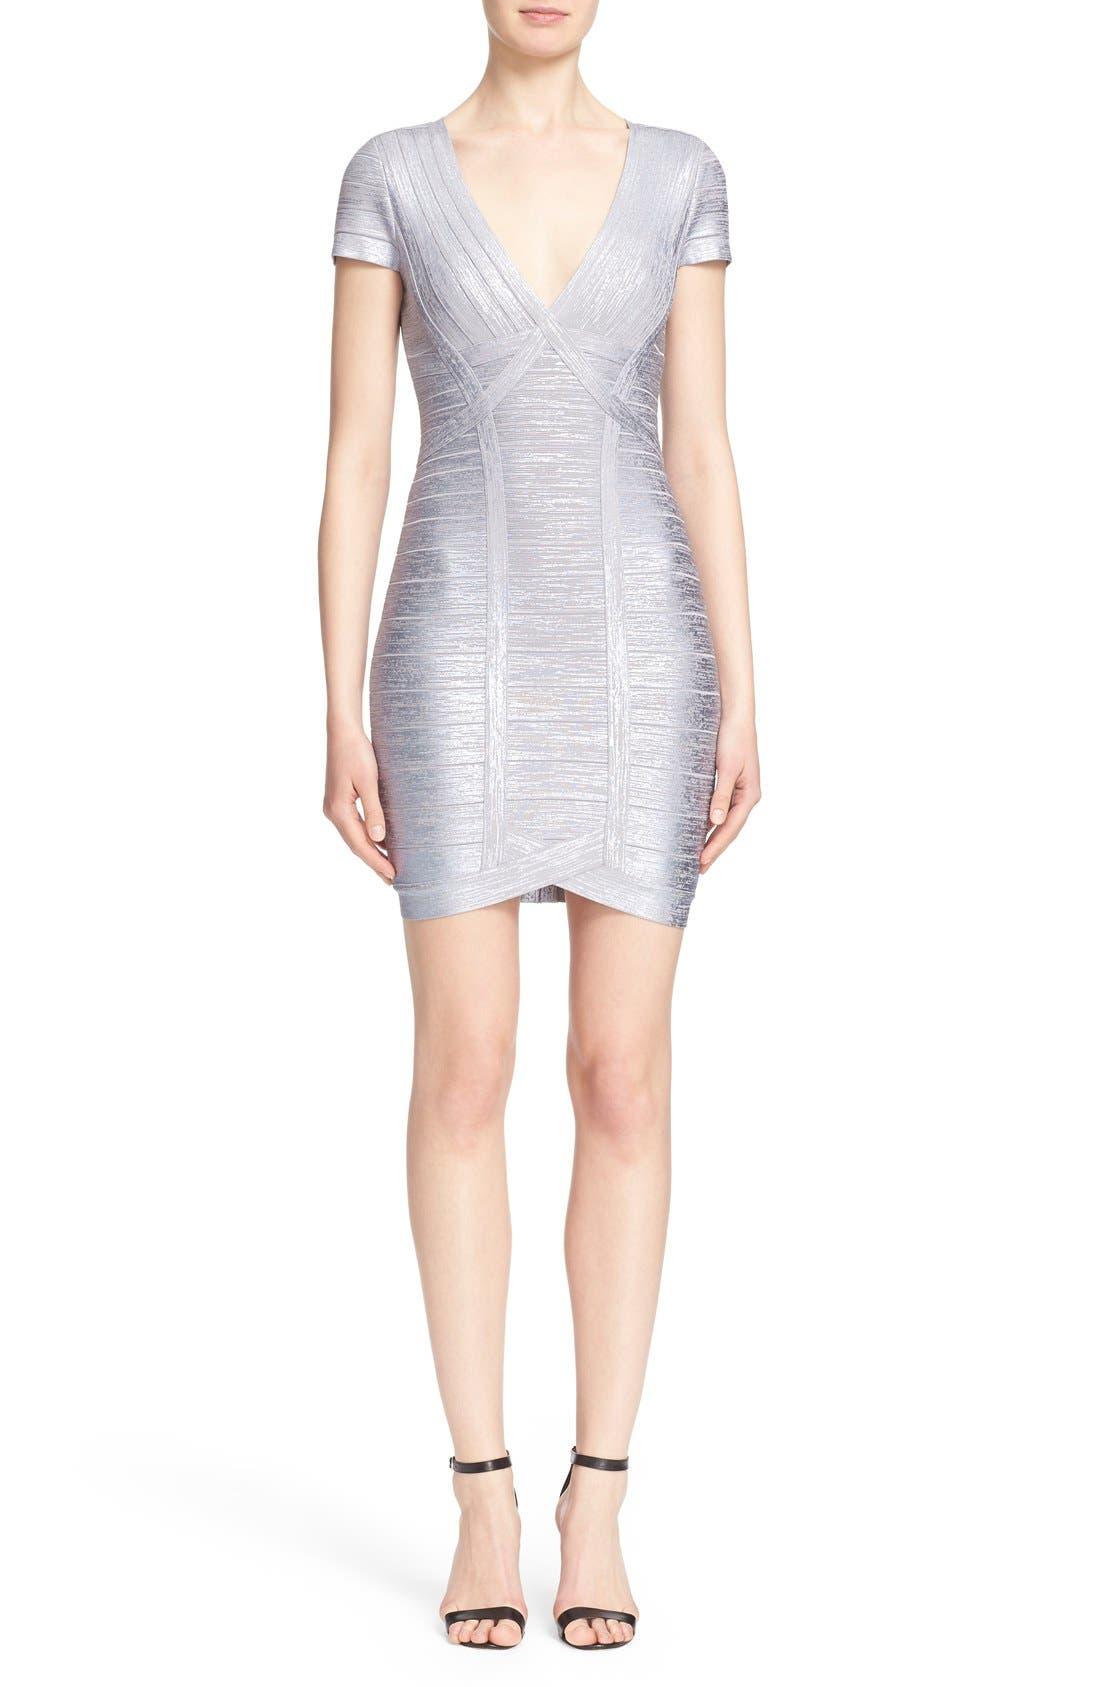 Main Image - Herve Leger 'Klaudia' Woodgrain Metallic Foil Dress